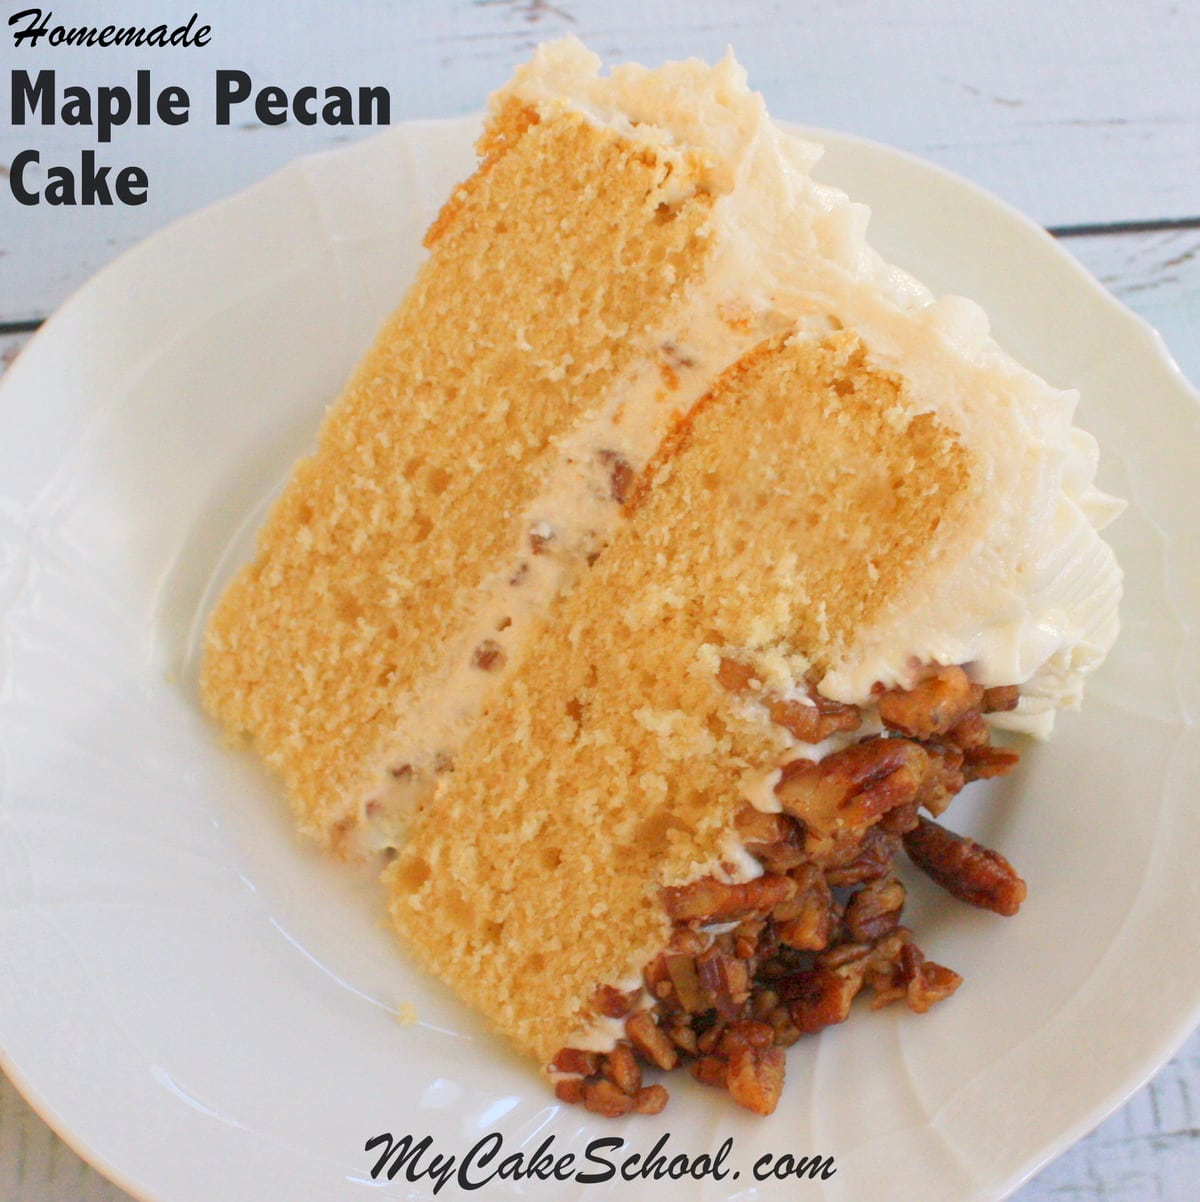 Decorative Cake Recipes From Scratch